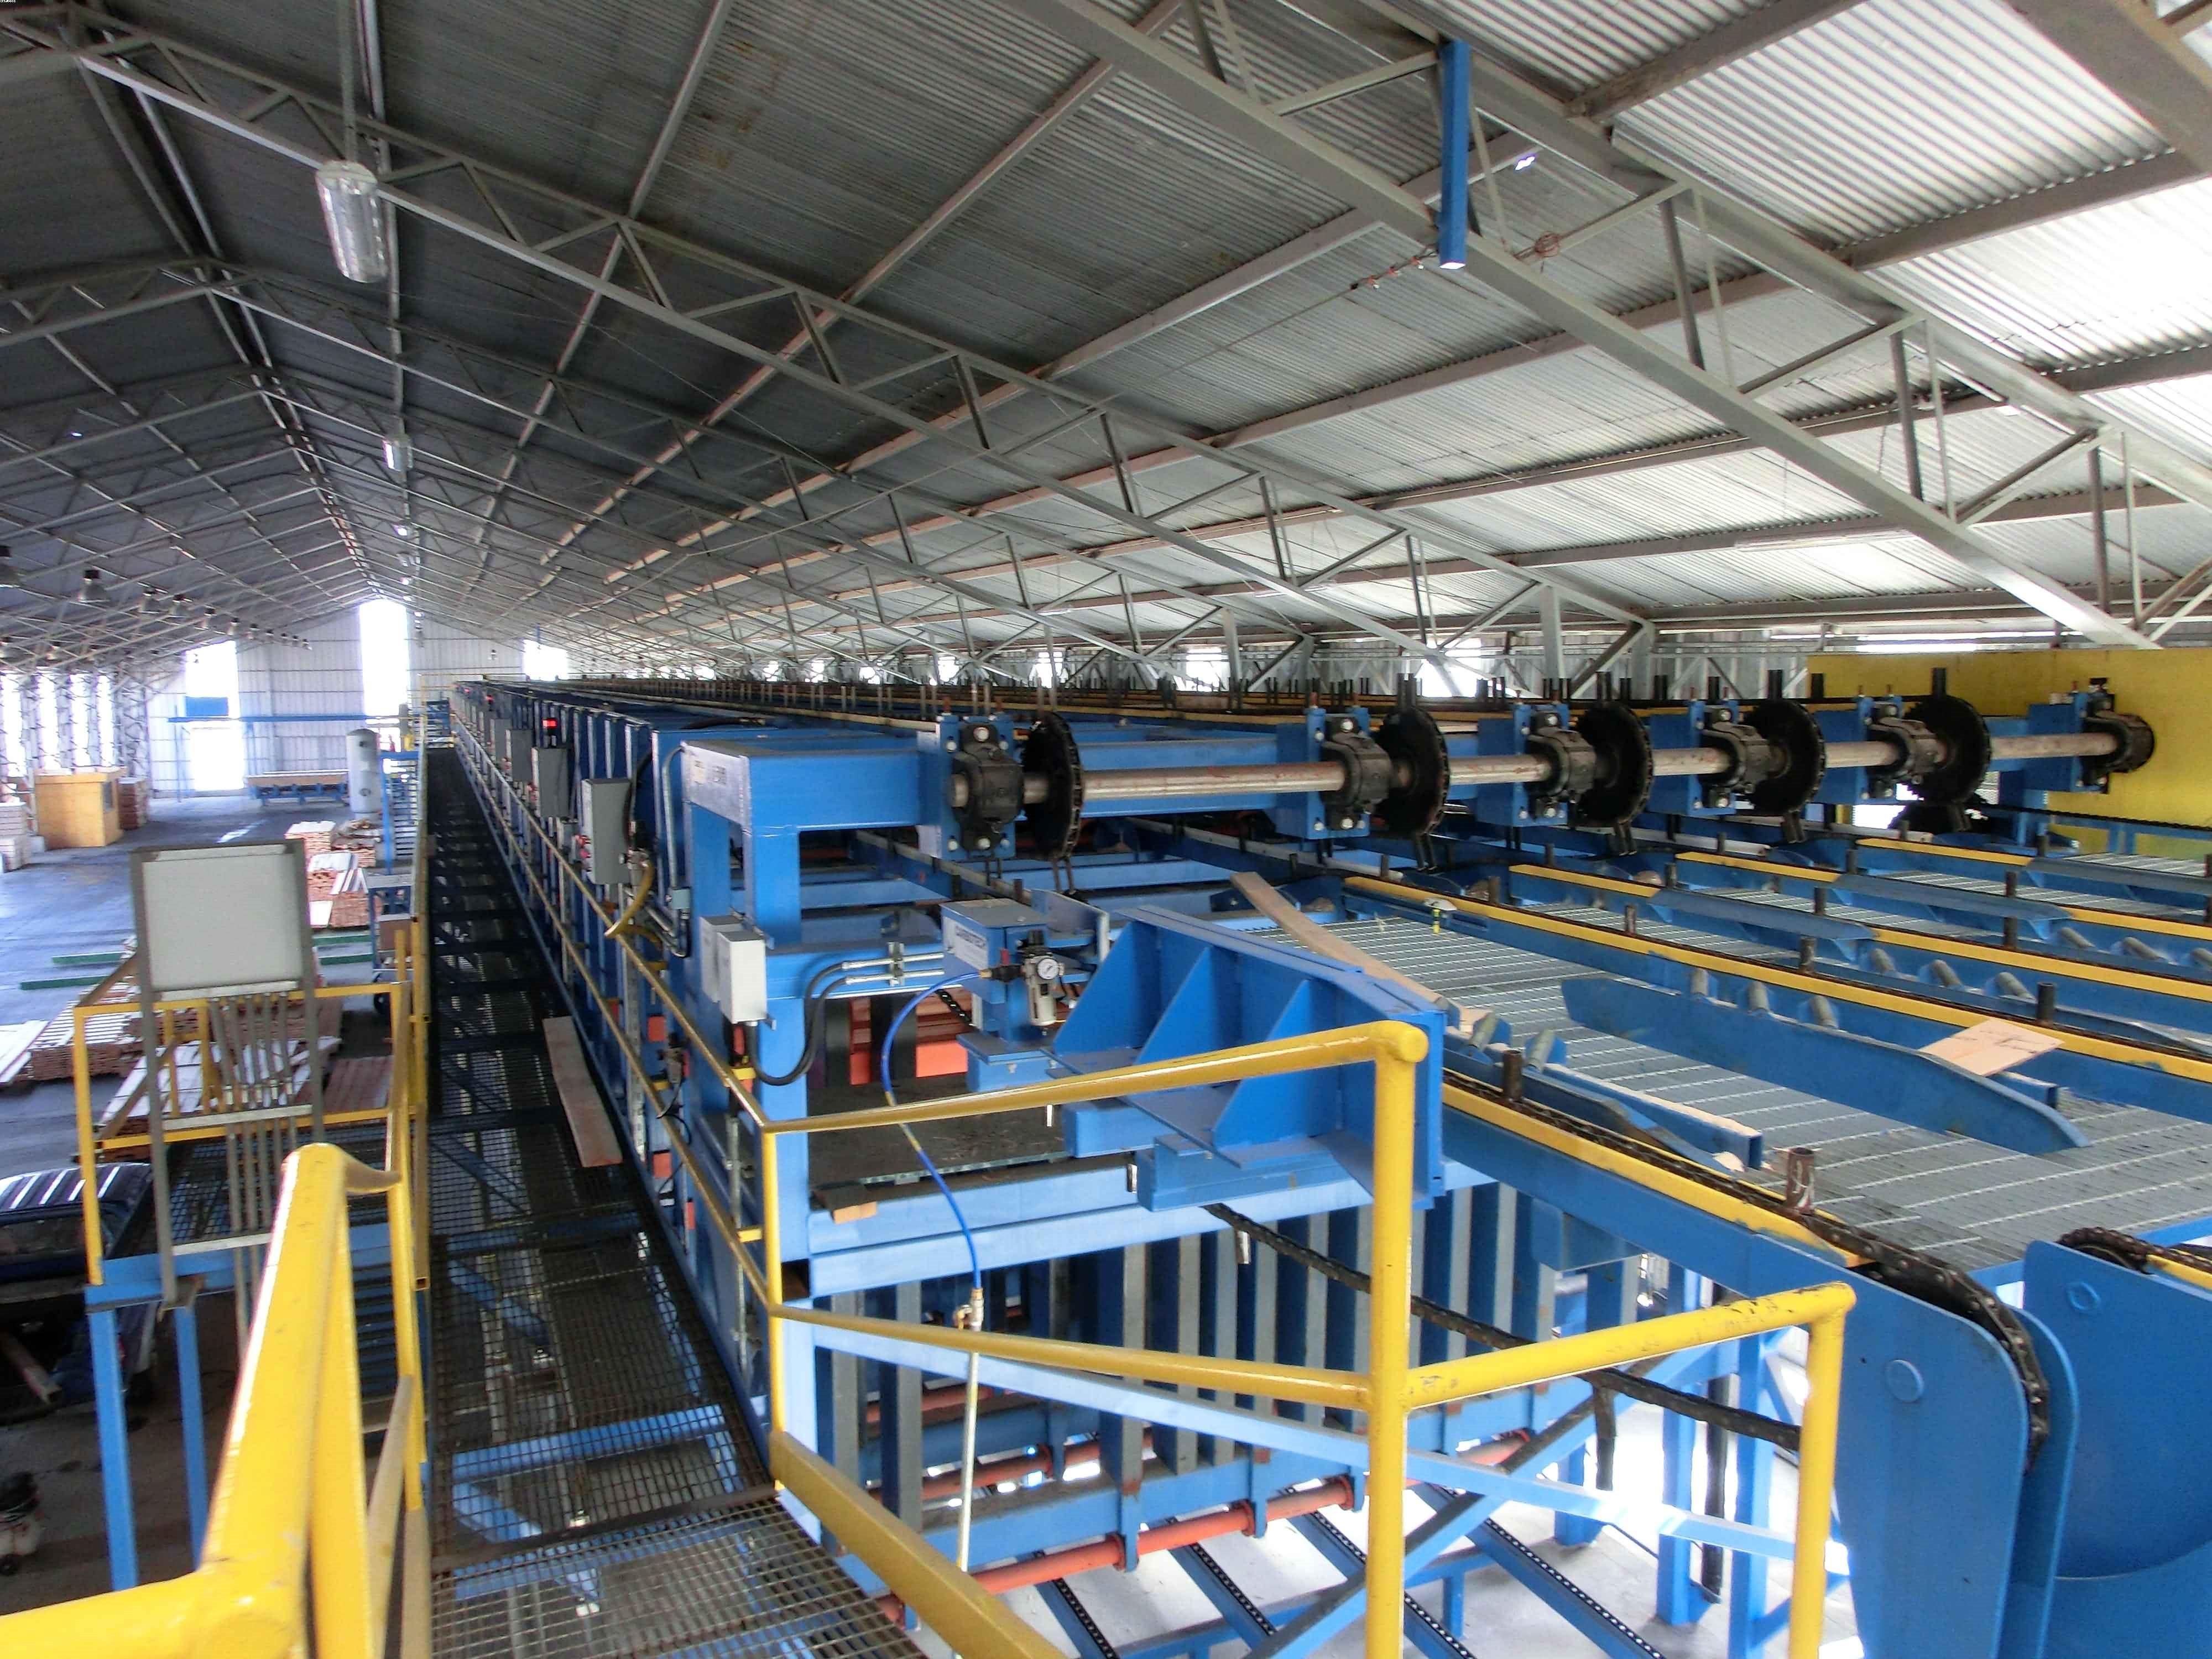 bin sorter tray sorter carbotech fabricant d équipement et de